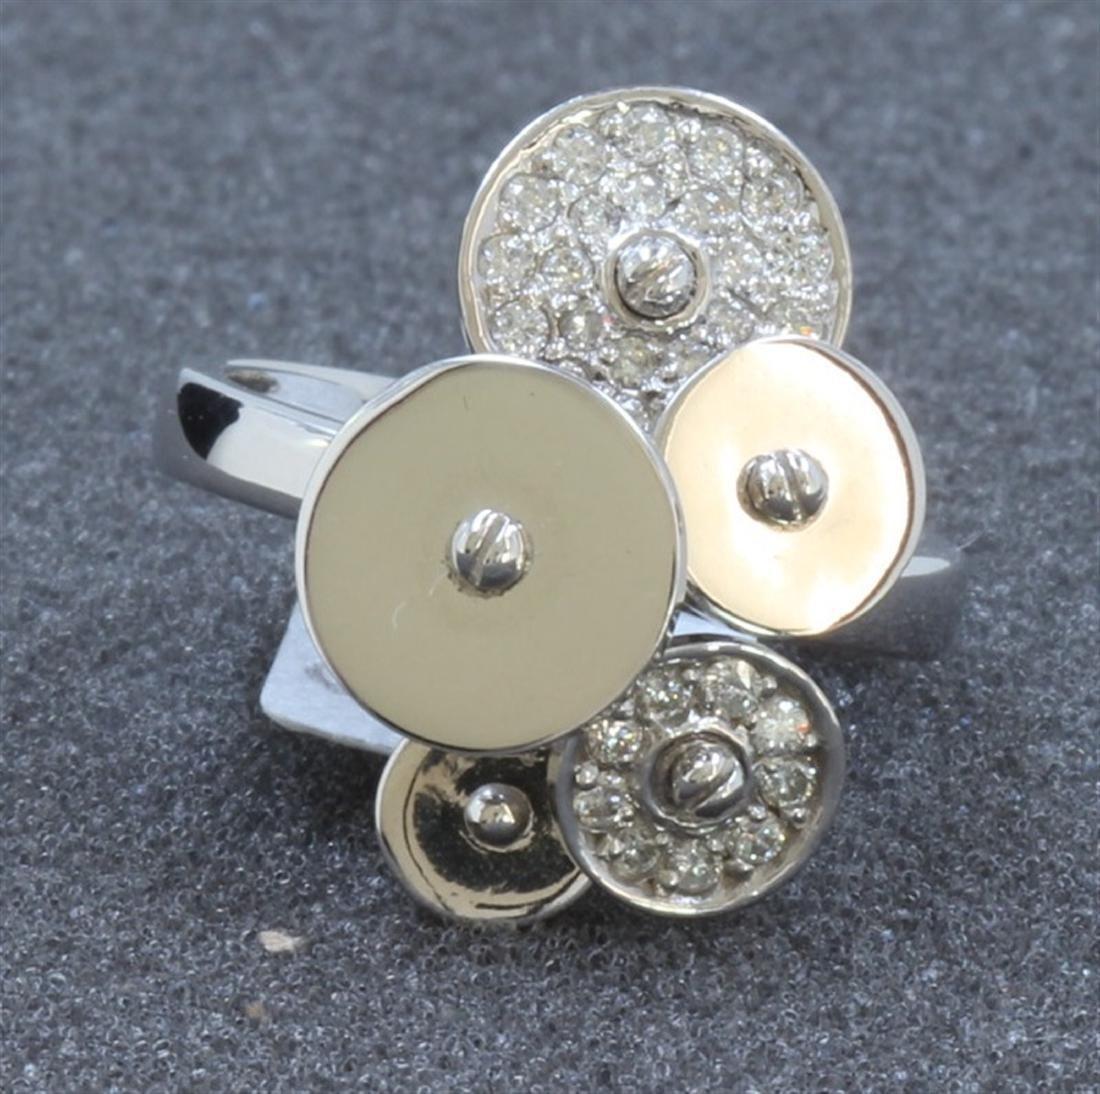 14K WHITE GOLD RING : 6.8g / Diamond: 0.33ct